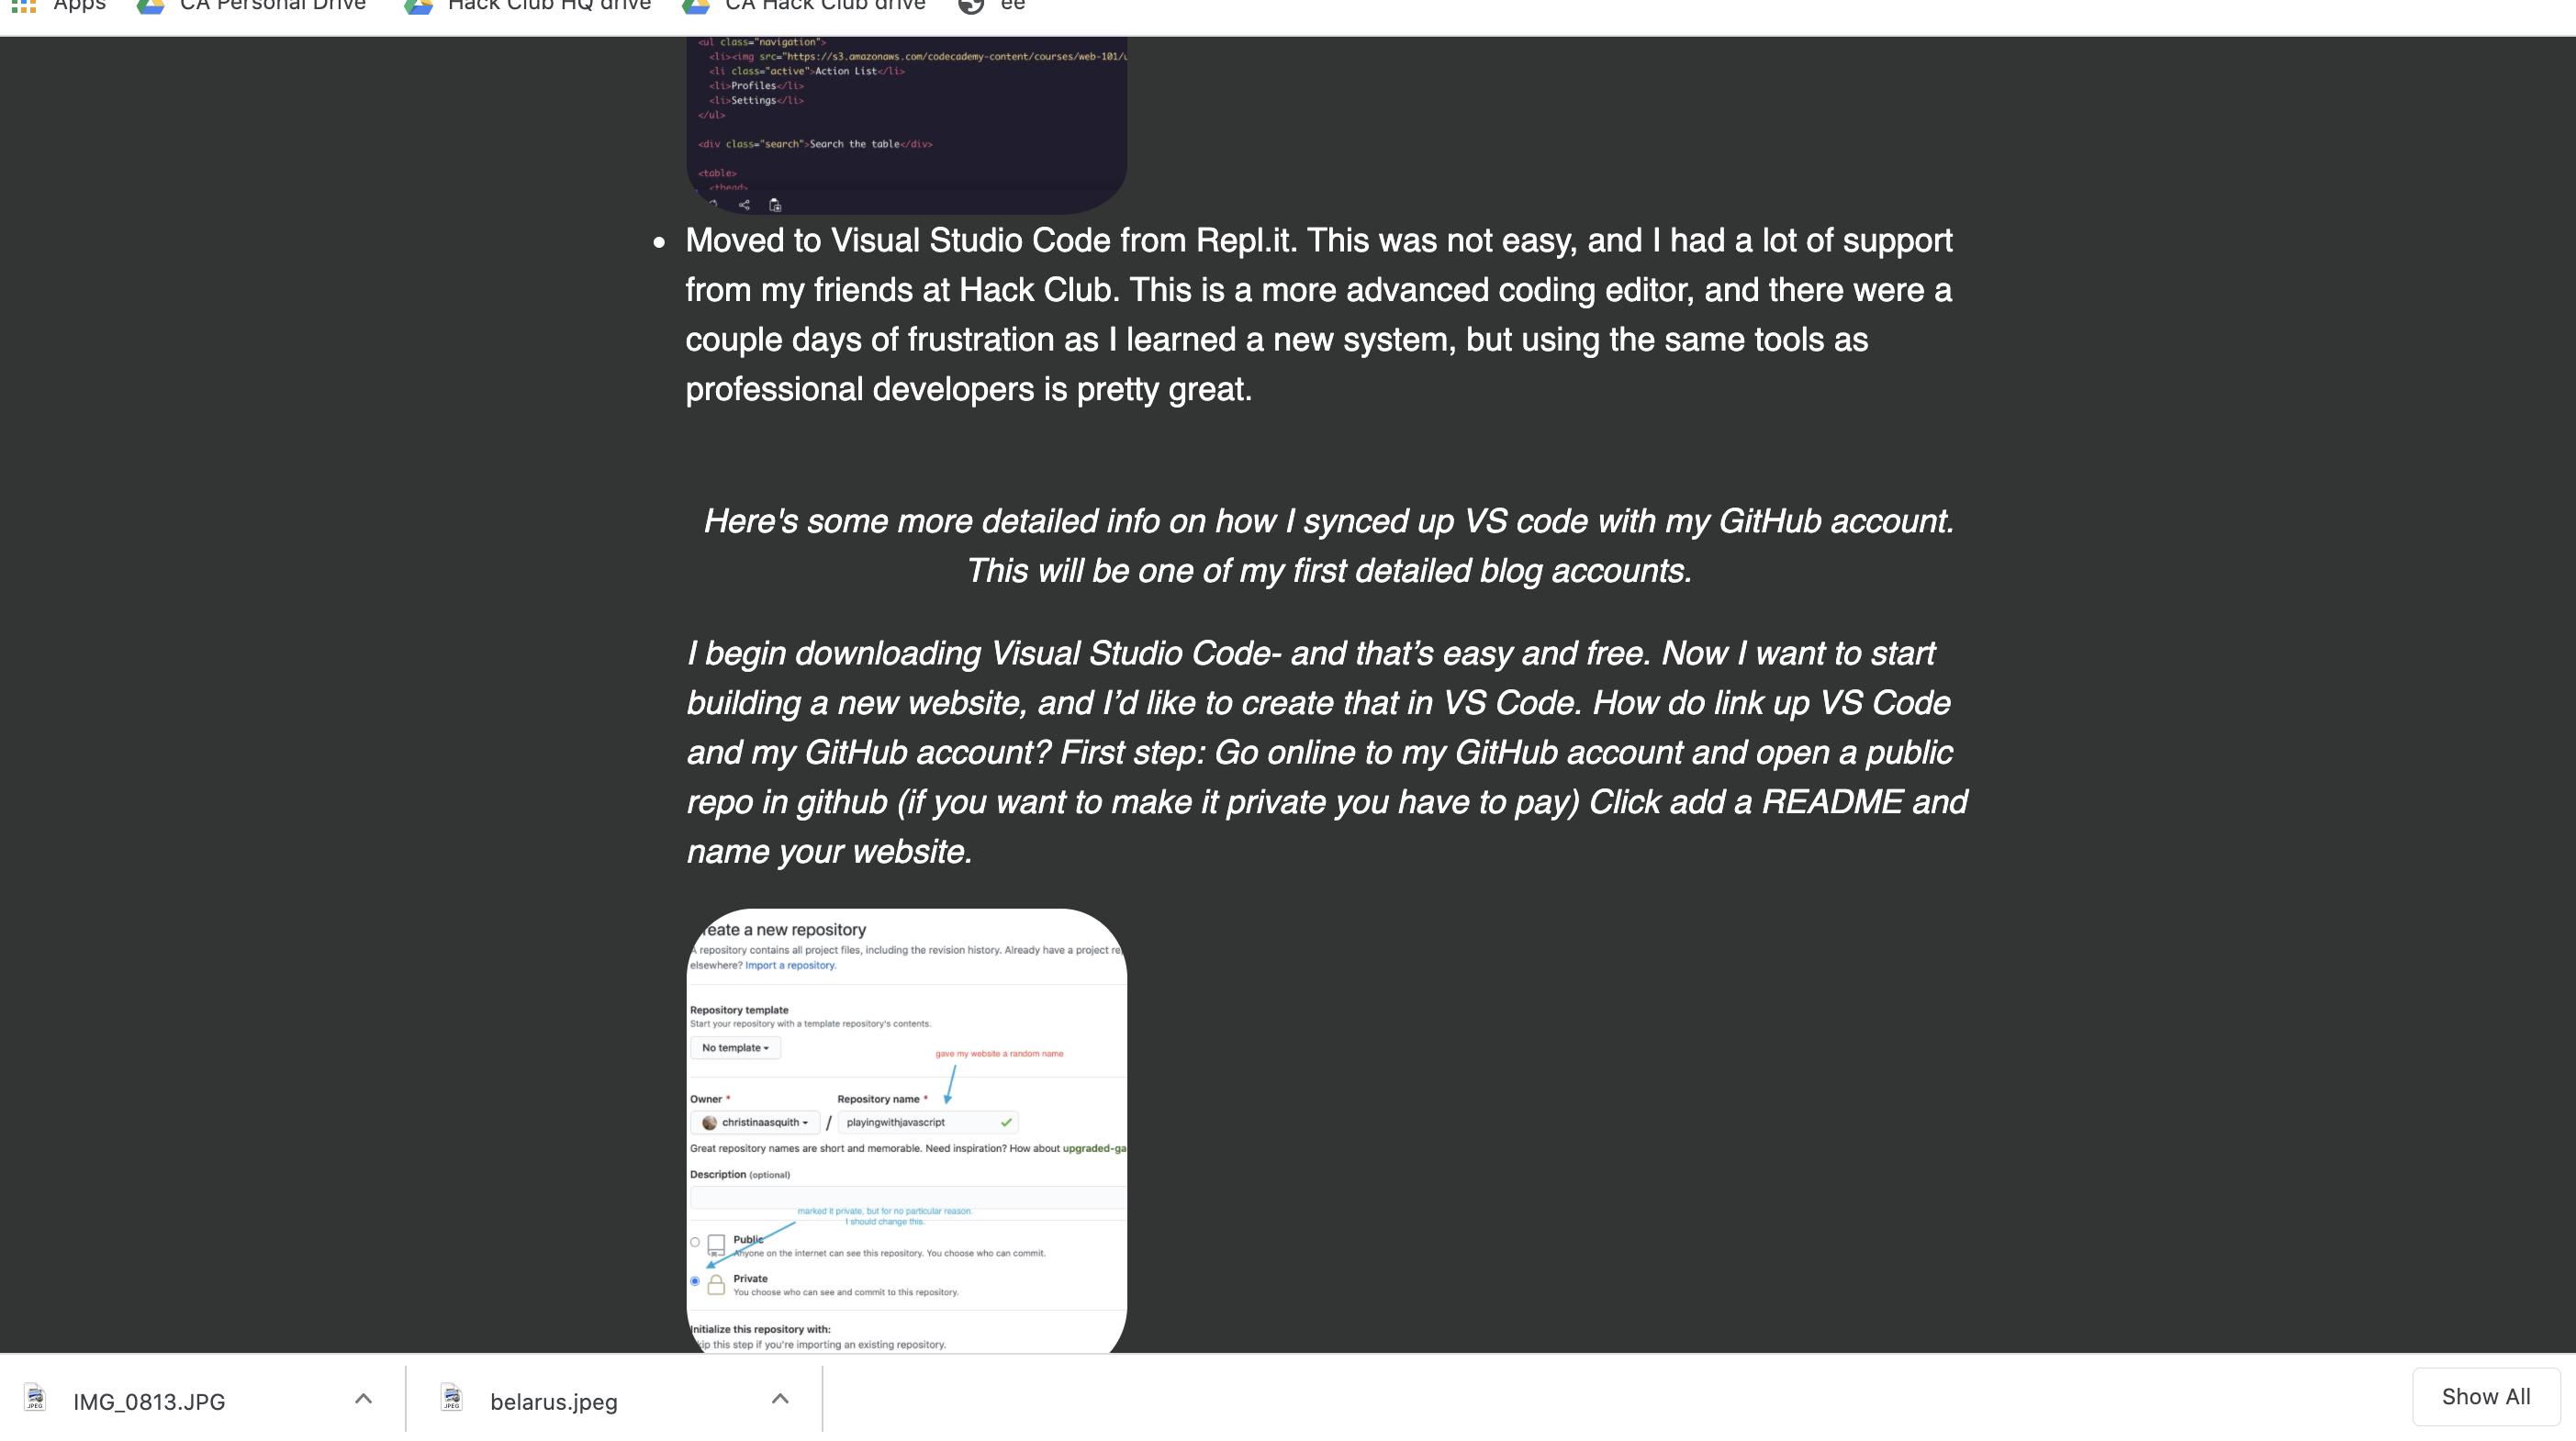 https://cloud-1179rifnu.vercel.app/0screen_shot_2020-09-18_at_2.12.18_pm.png